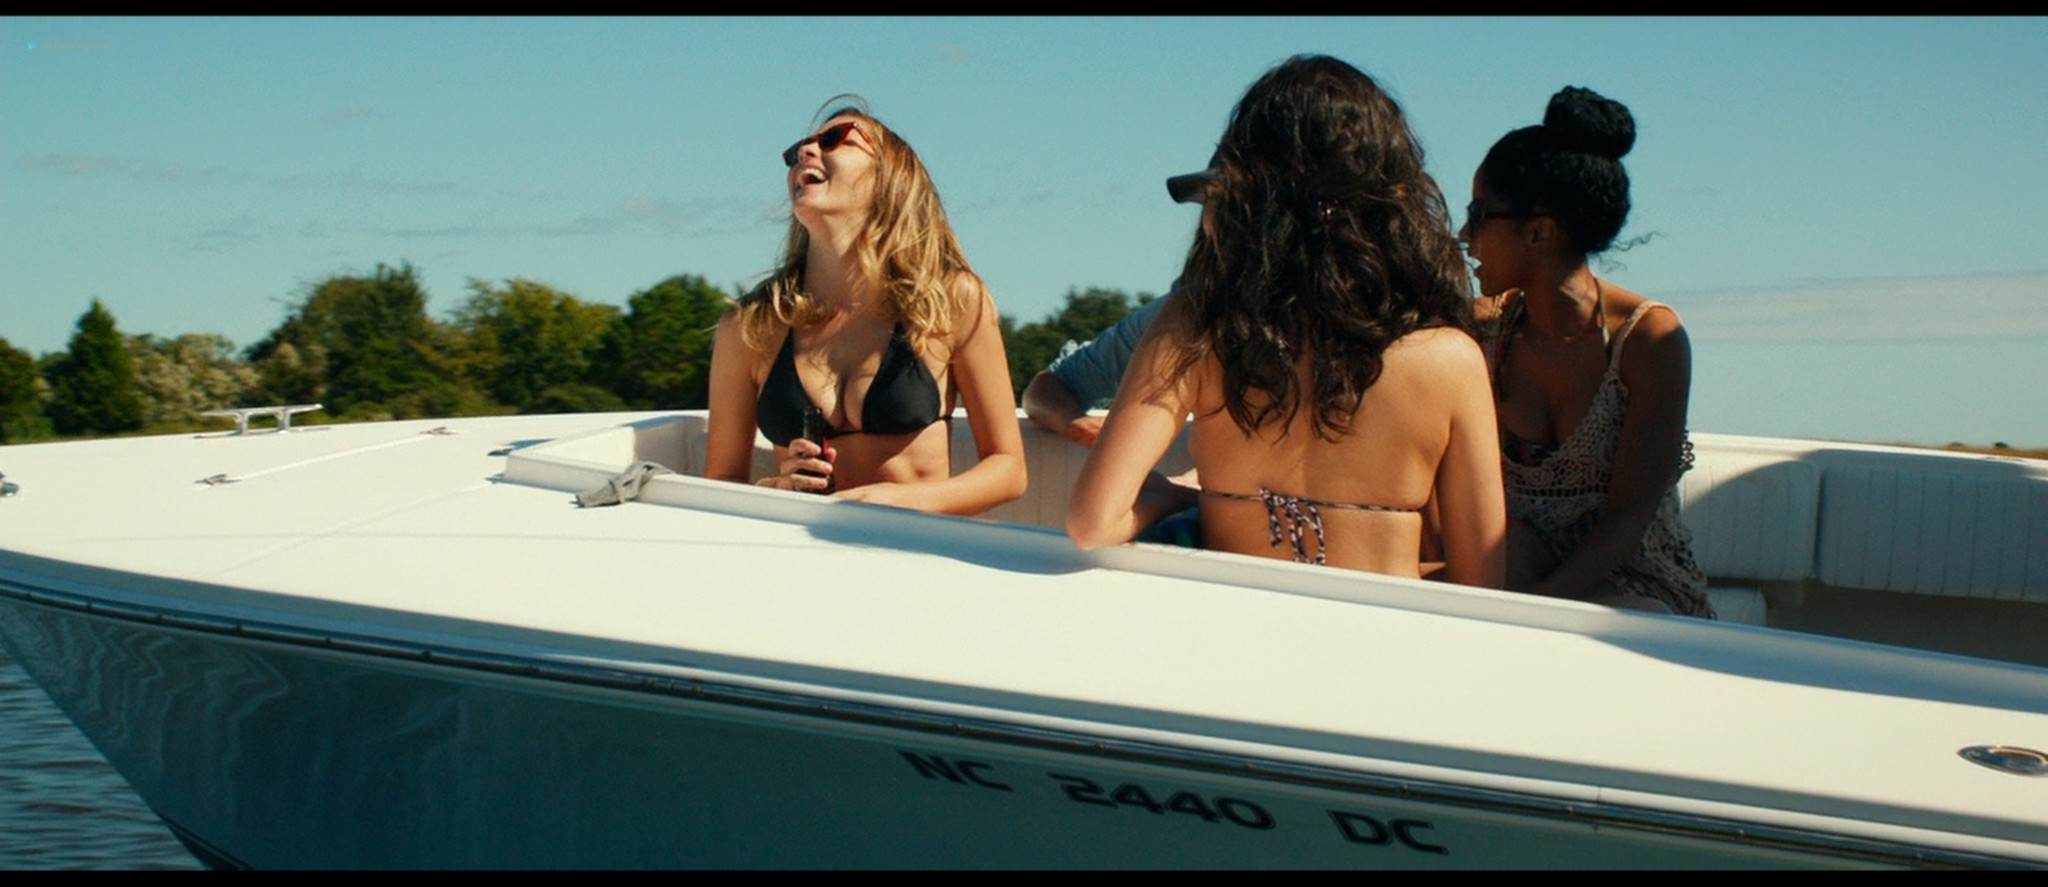 Teresa Palmer hot bikini and Maggie Grace, Alexandra Daddario hot too - The Choice (2016) HD 1080p BluRay (12)